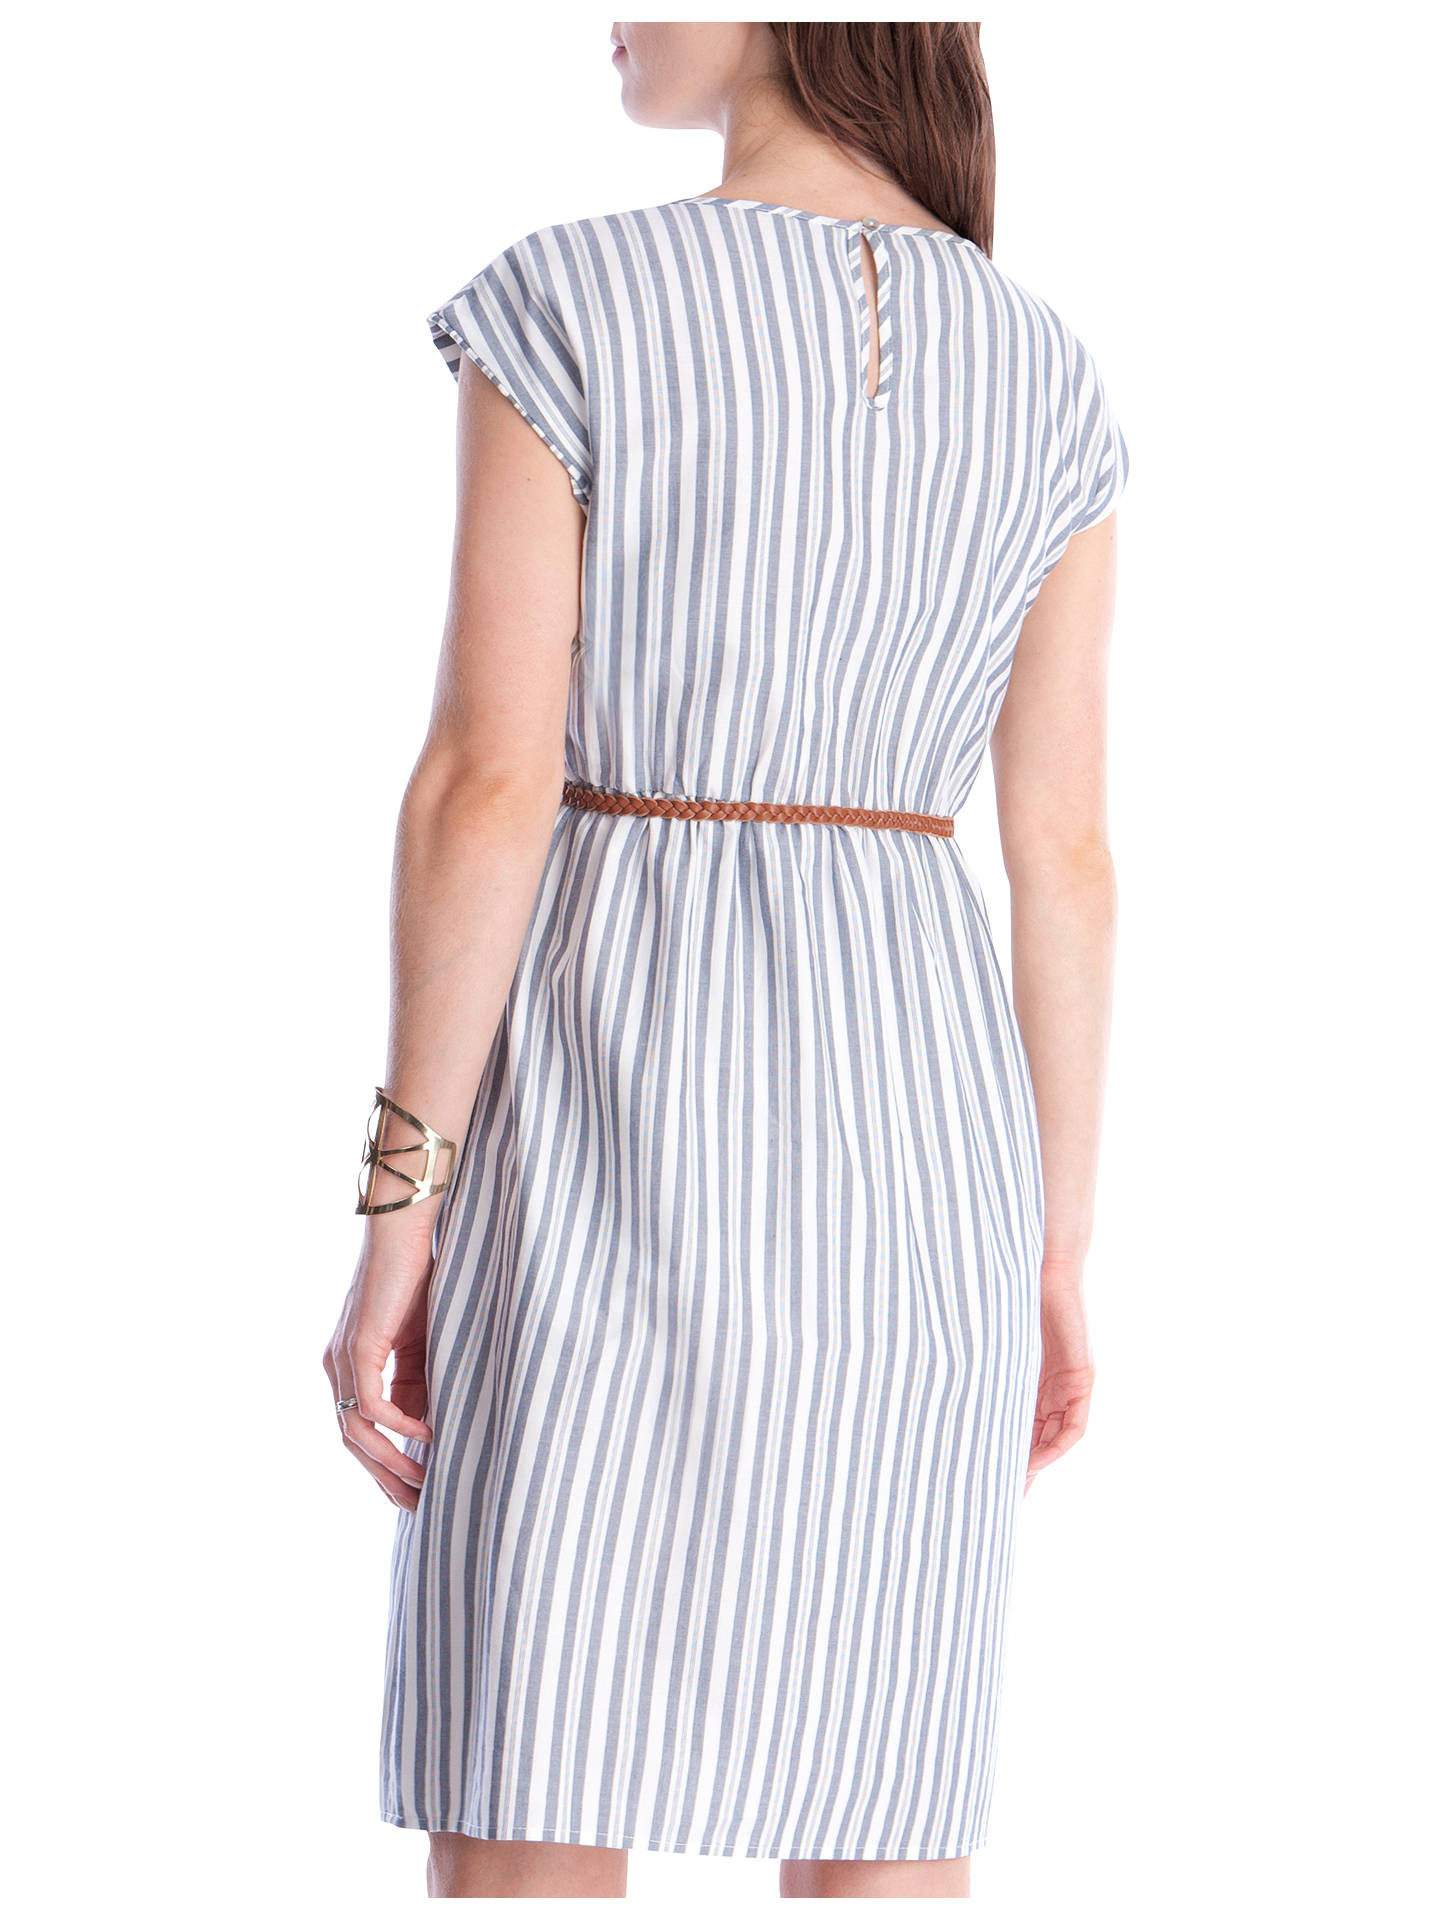 d73ebfff86385 ... Buy Séraphine Presley Cotton Stripe Maternity Nursing Dress,  Blue/White, 8 Online at ...